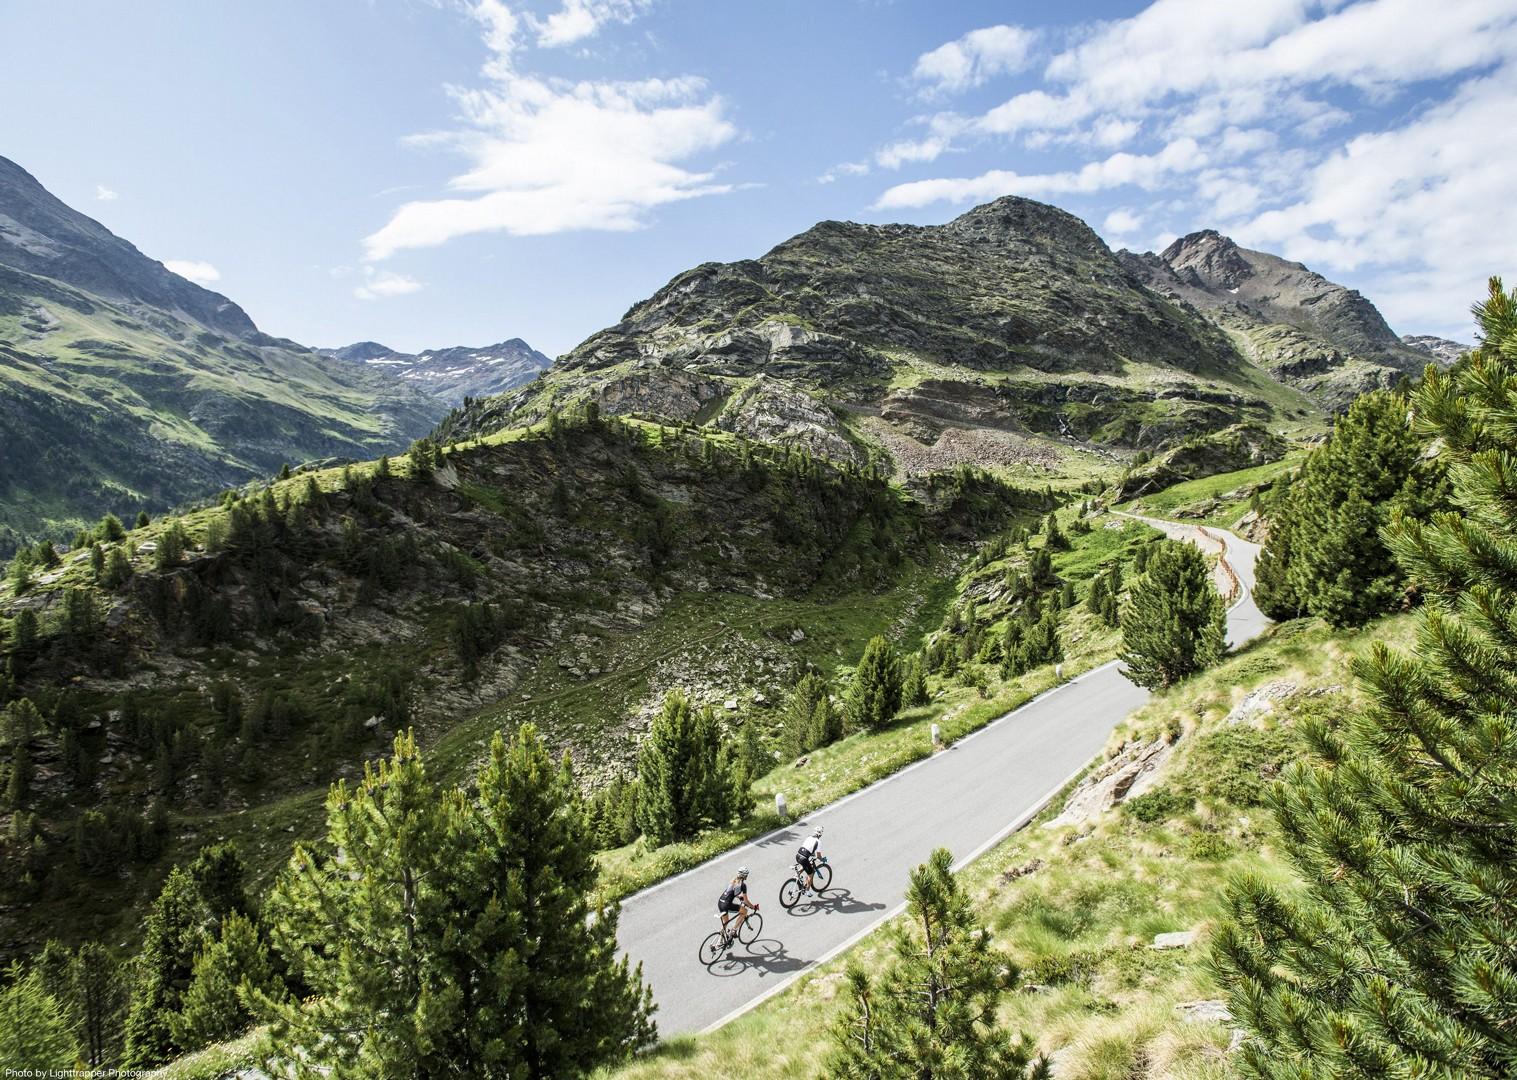 citta-alta-guided-road-cycling-holiday.jpg - Italy - Italian Alps - Guided Road Cycling Holiday - Italia Road Cycling